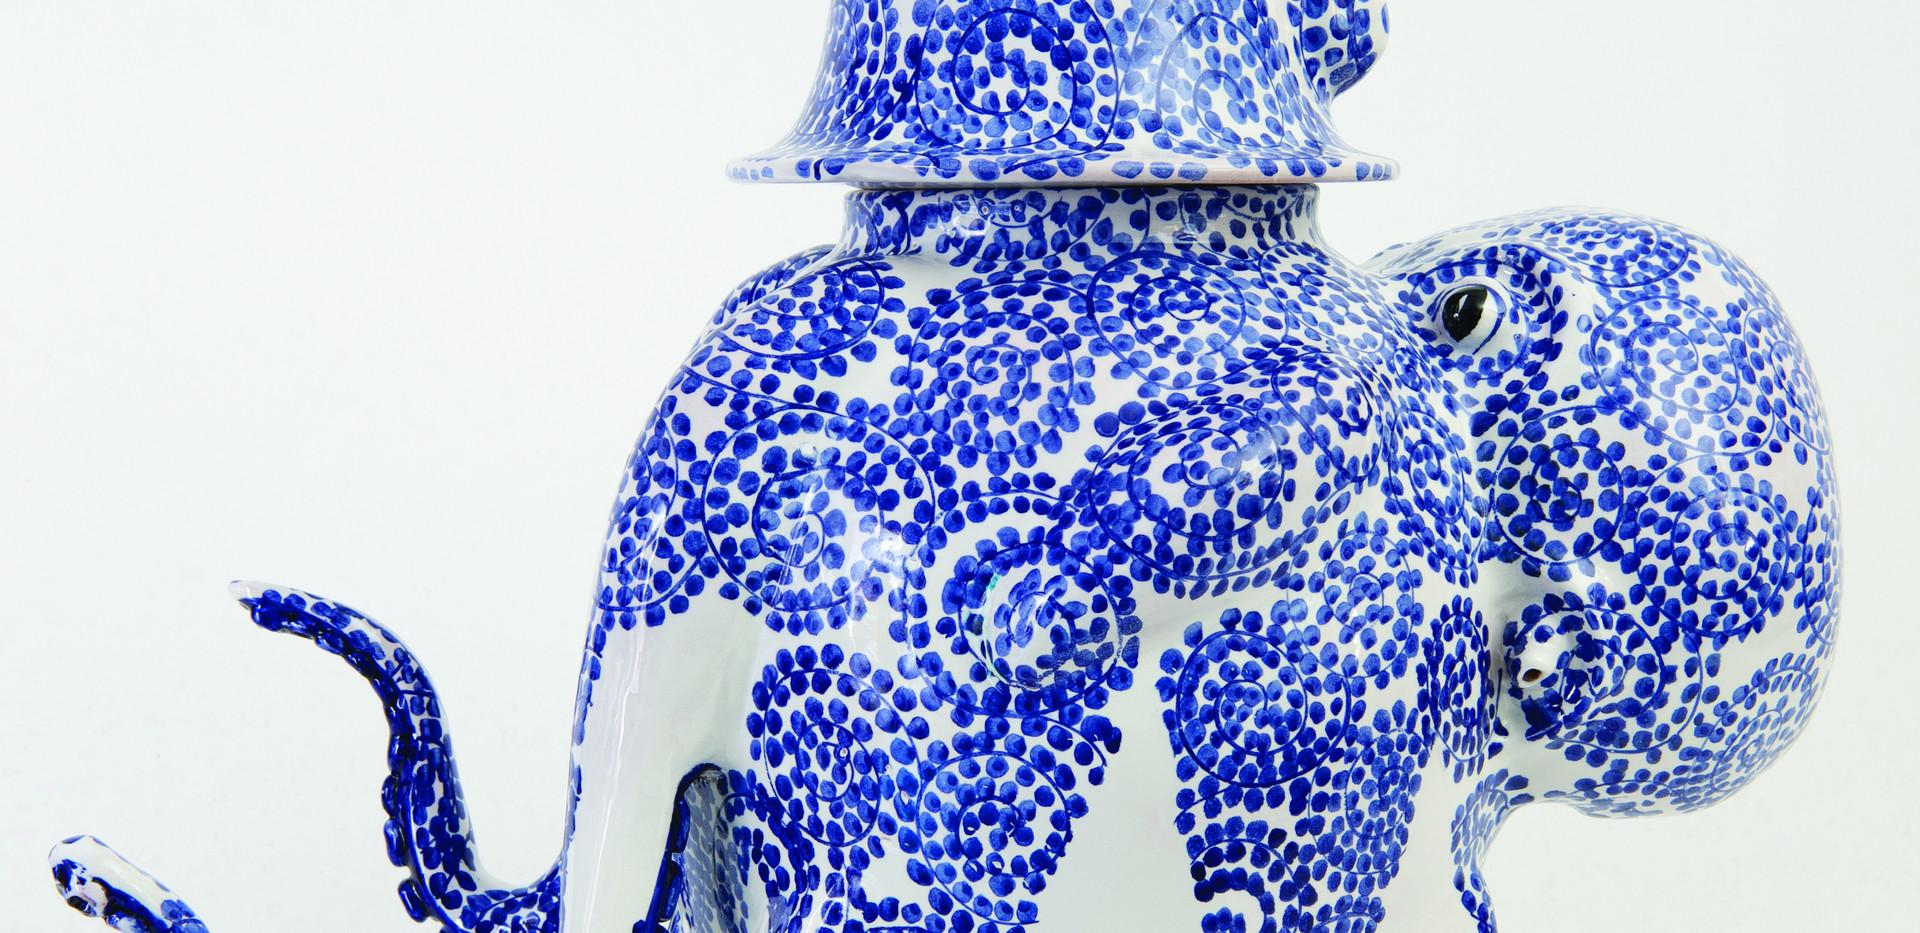 Octopus blue ink